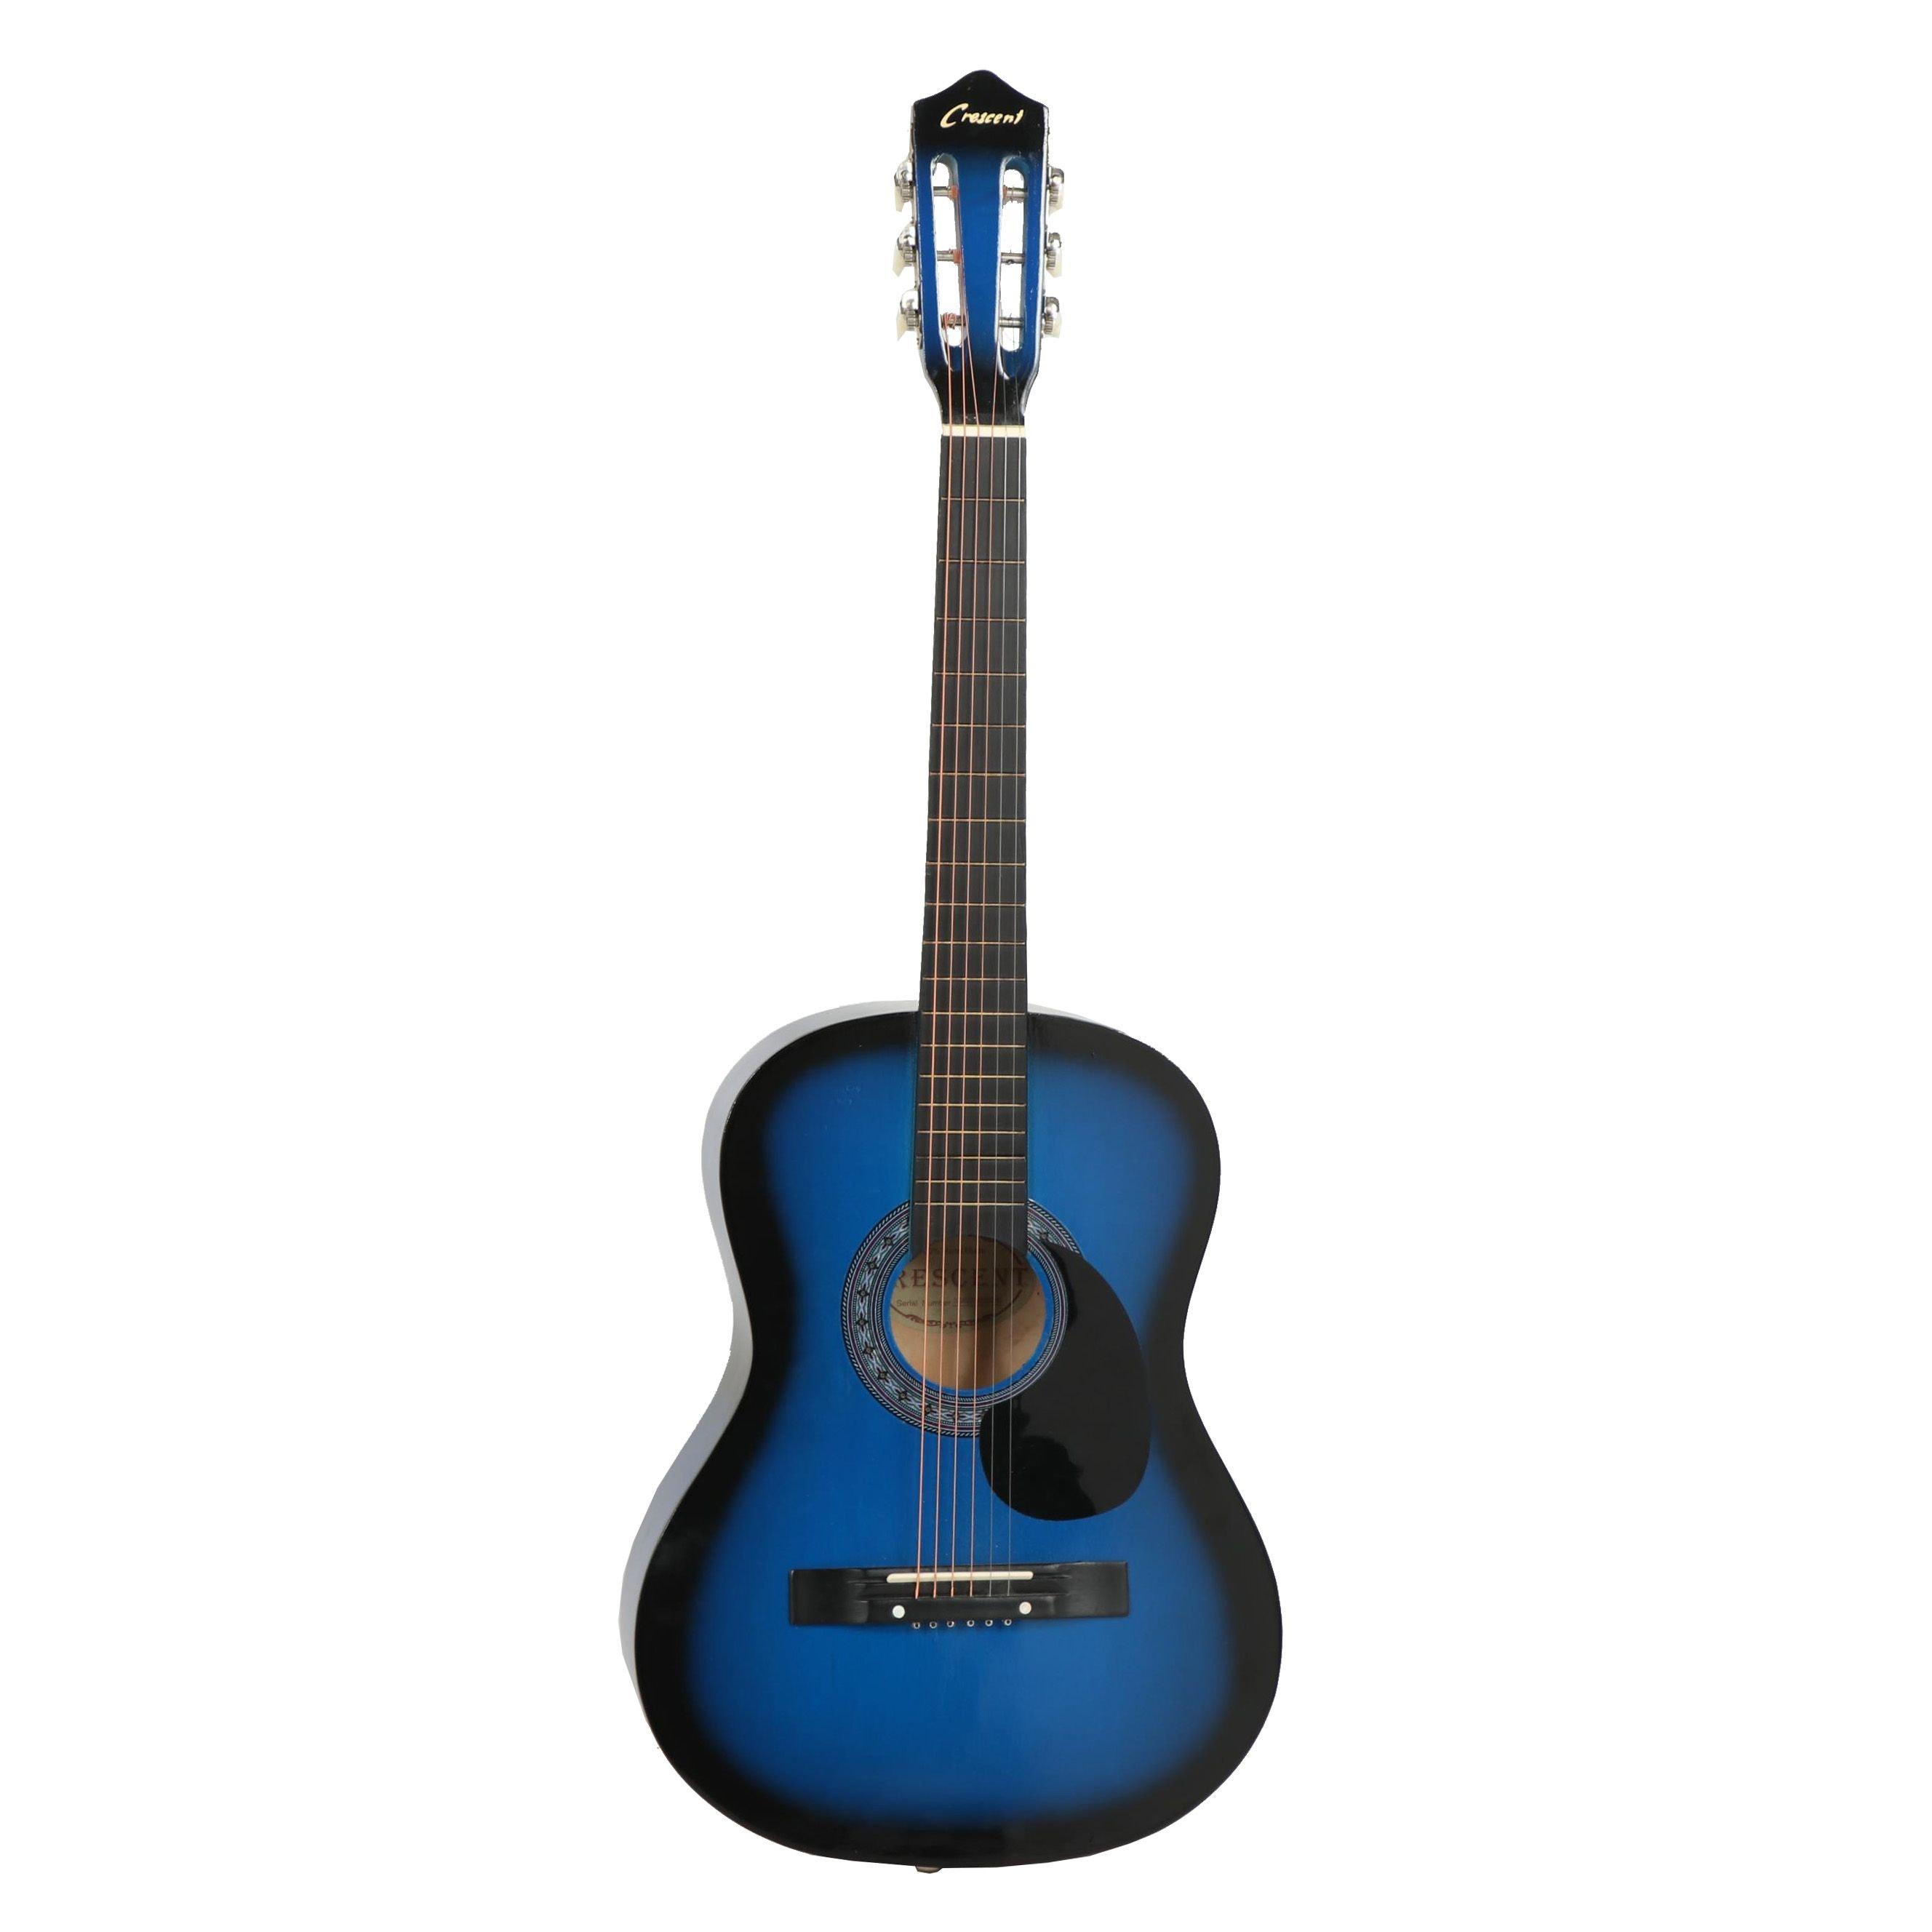 Crescent Acoustic Guitar